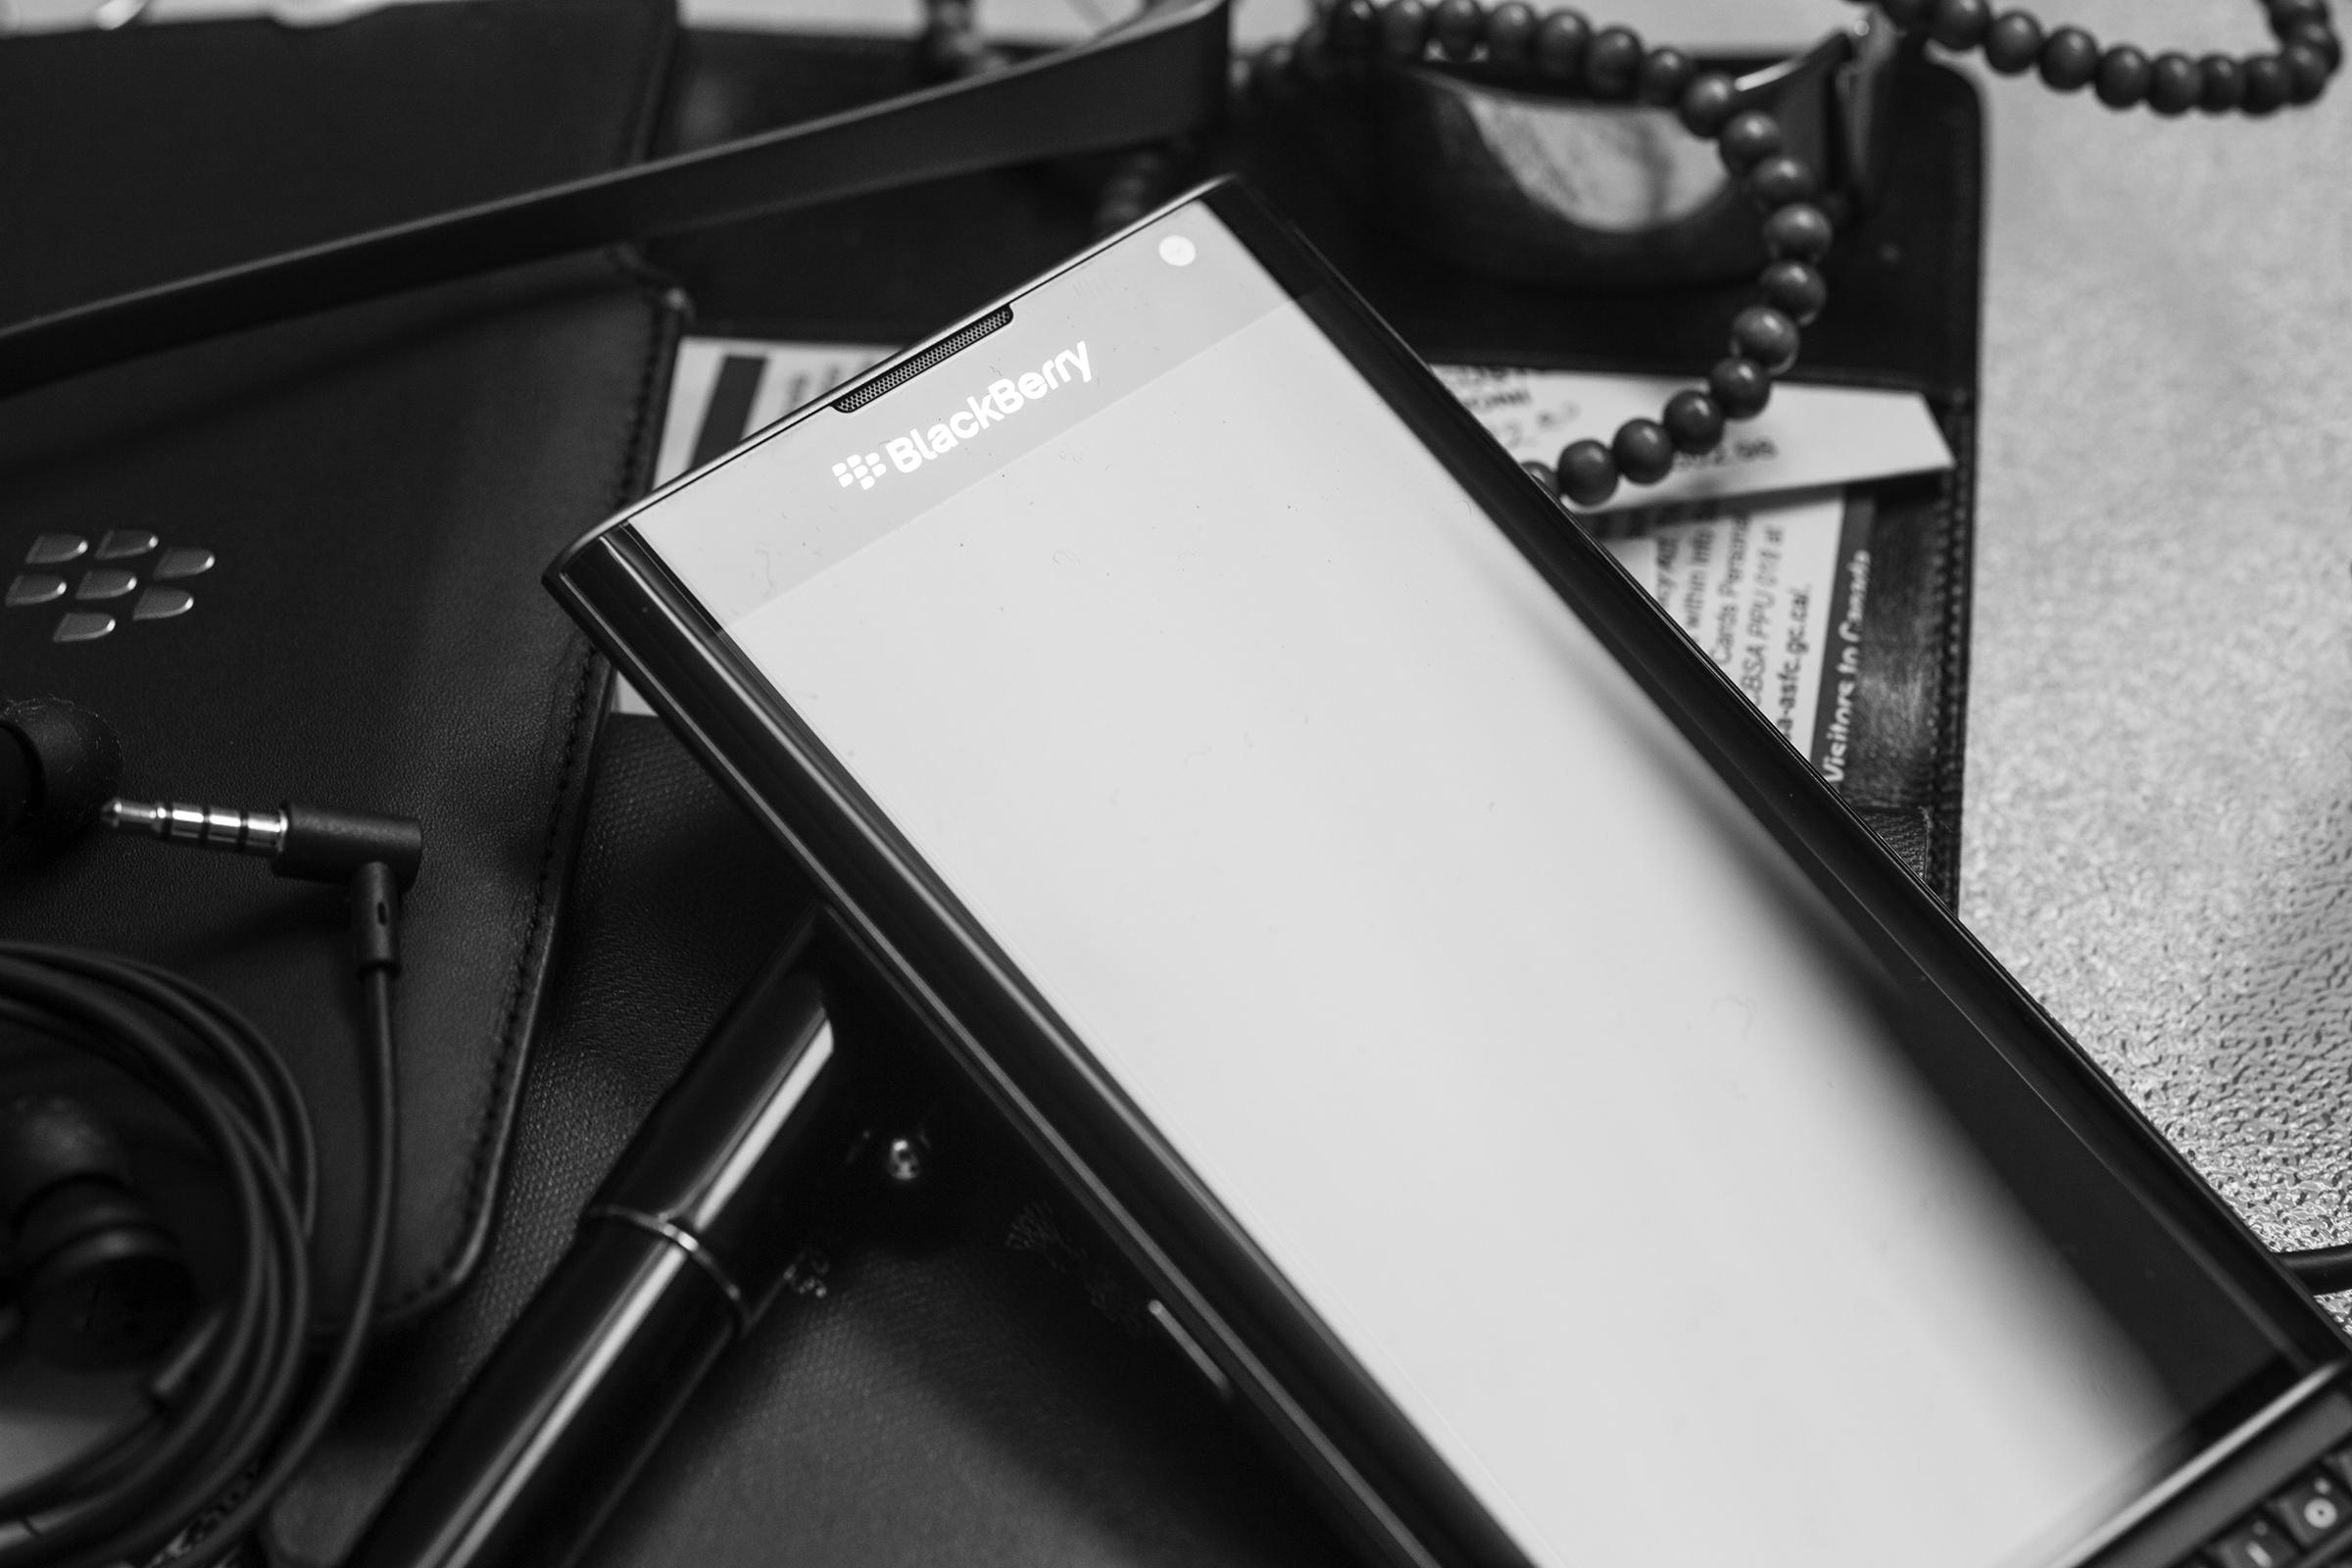 Luxusní displej BlackBerry Priv